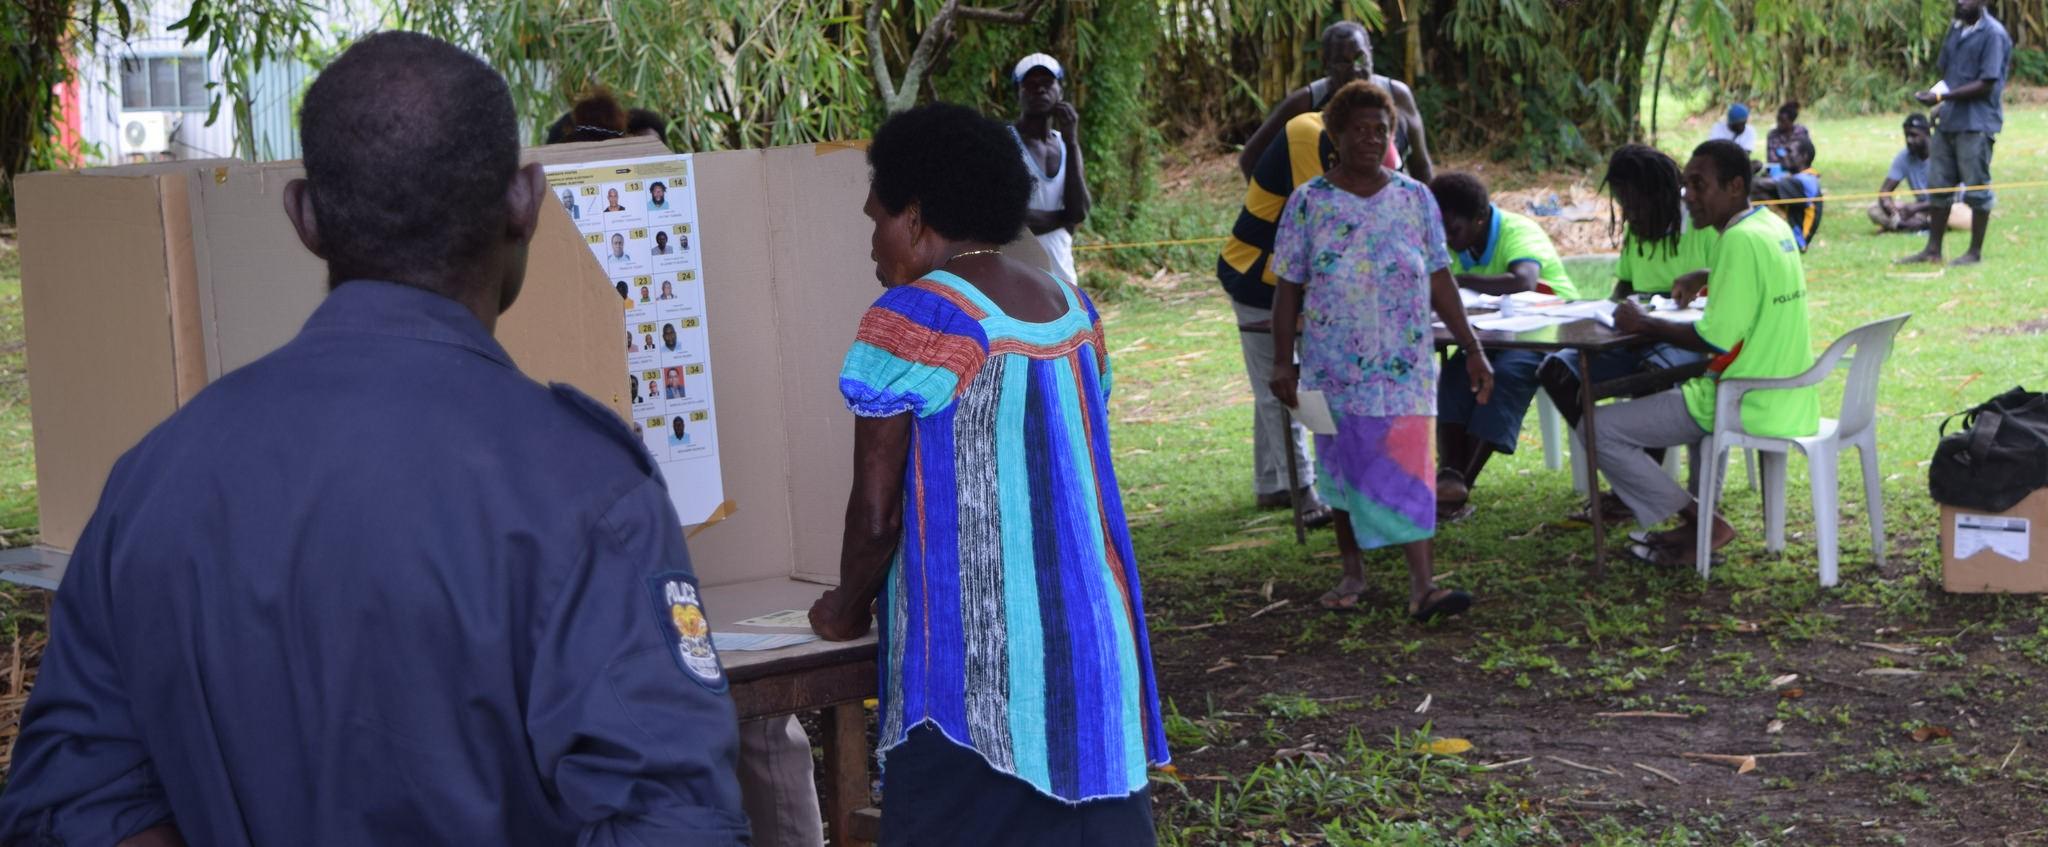 A woman votes in Bougainville, Papua New Guinea, June 2017 (Photo:Flickr/Commonwealth Secretariat)